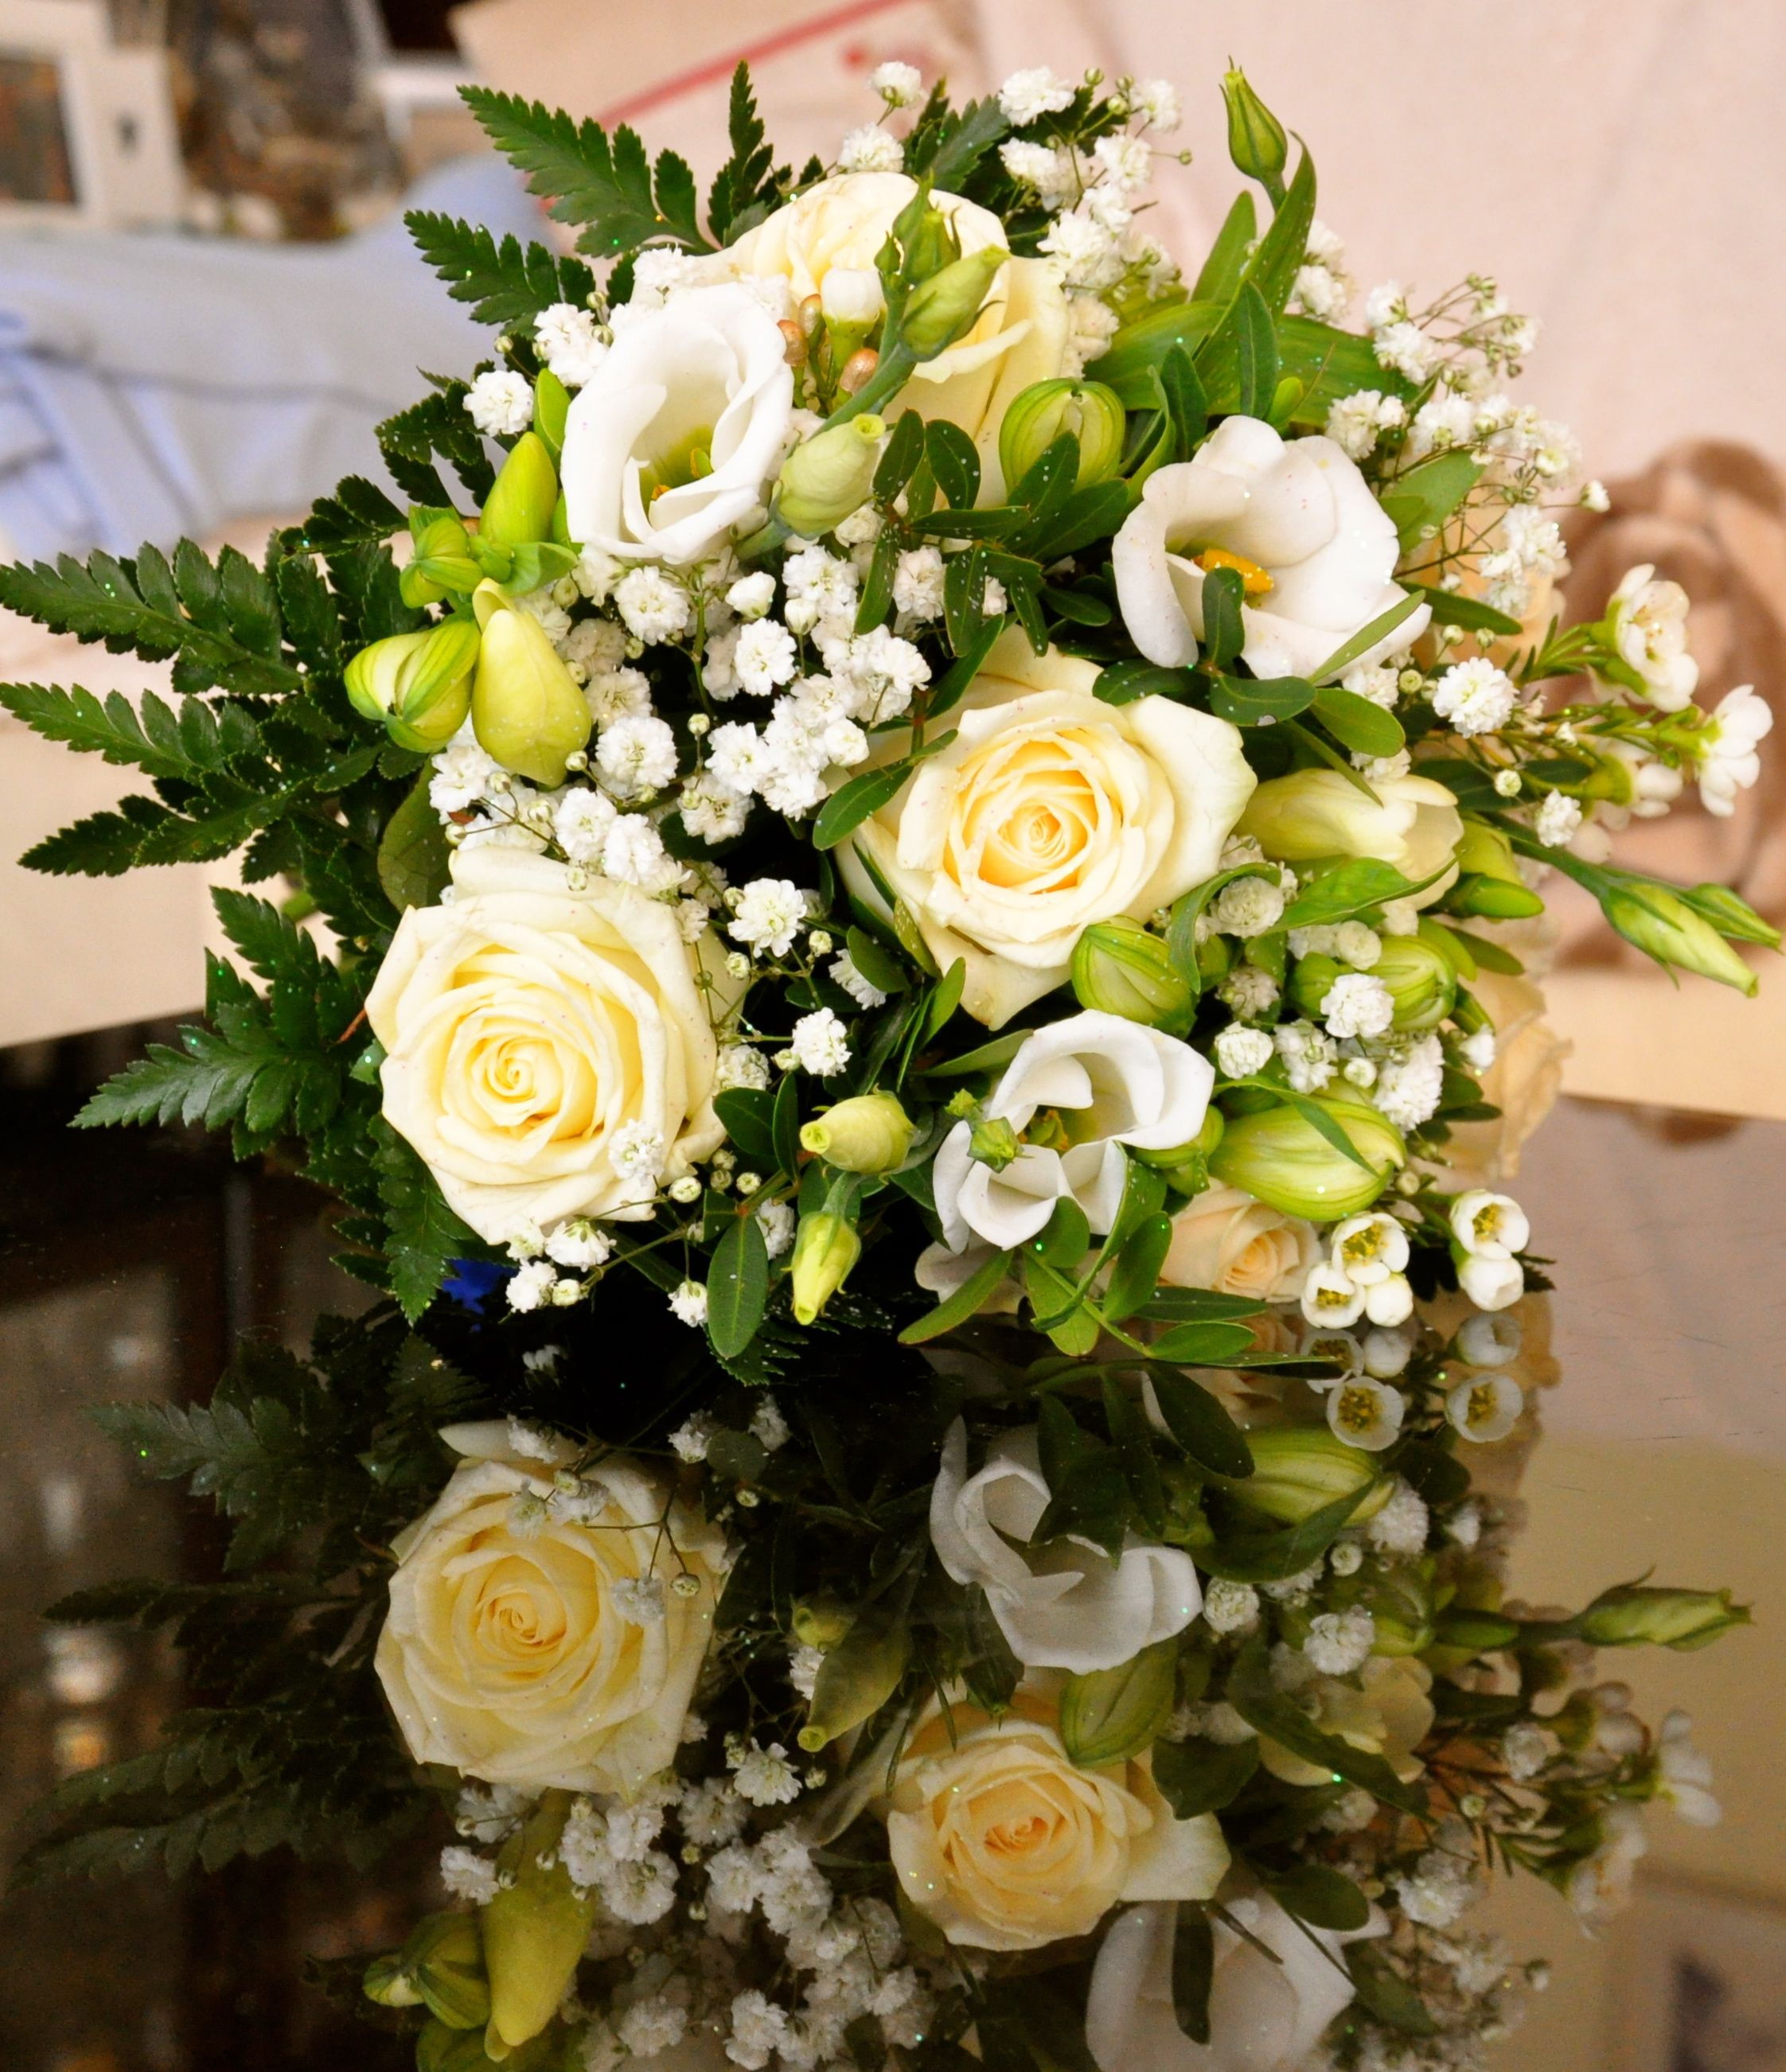 Mixed Whites Wedding Flowers Pinterest Flower Ideas